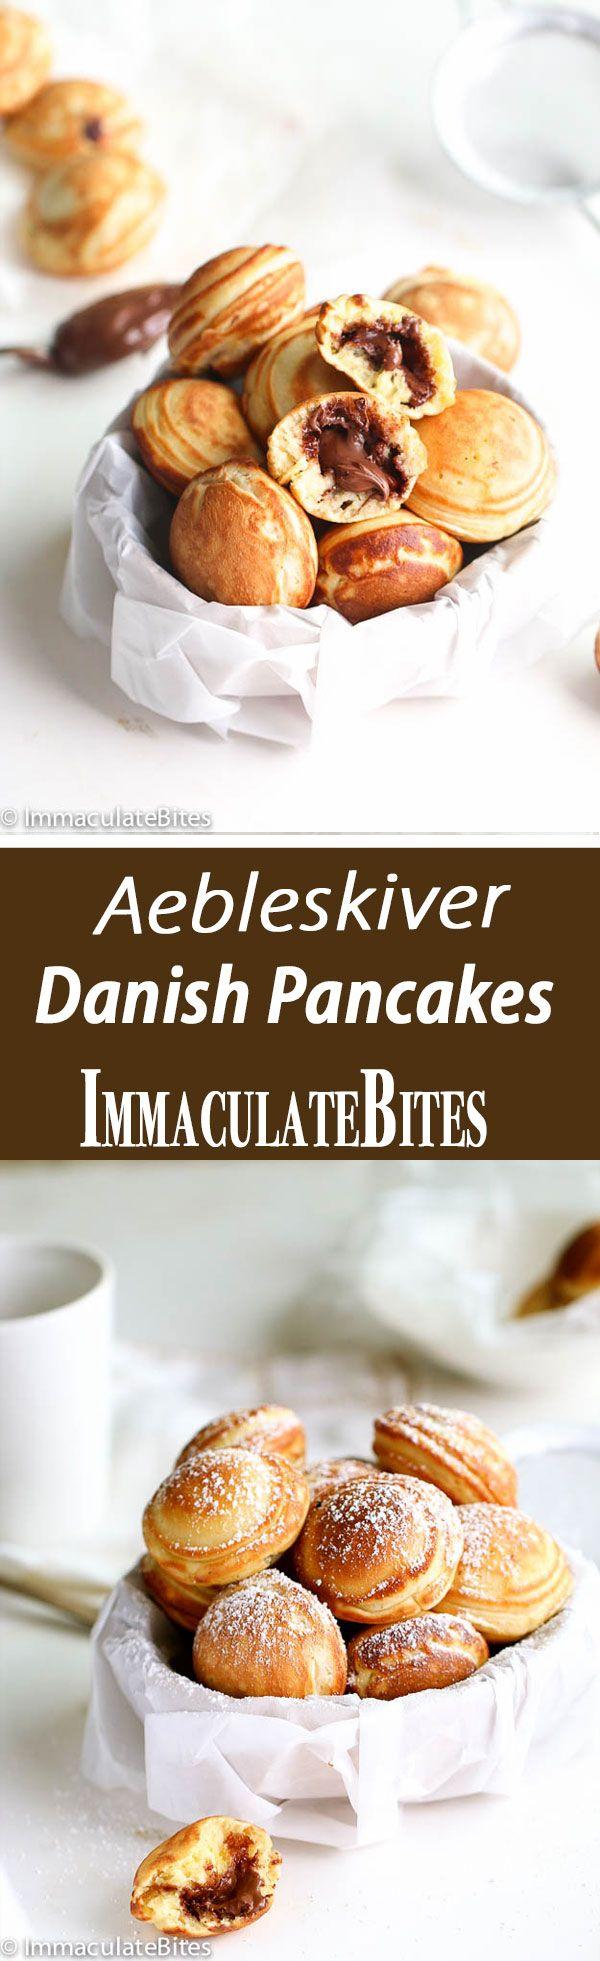 (Aebleskiver) Danish Pancakes stuffed with Nutella